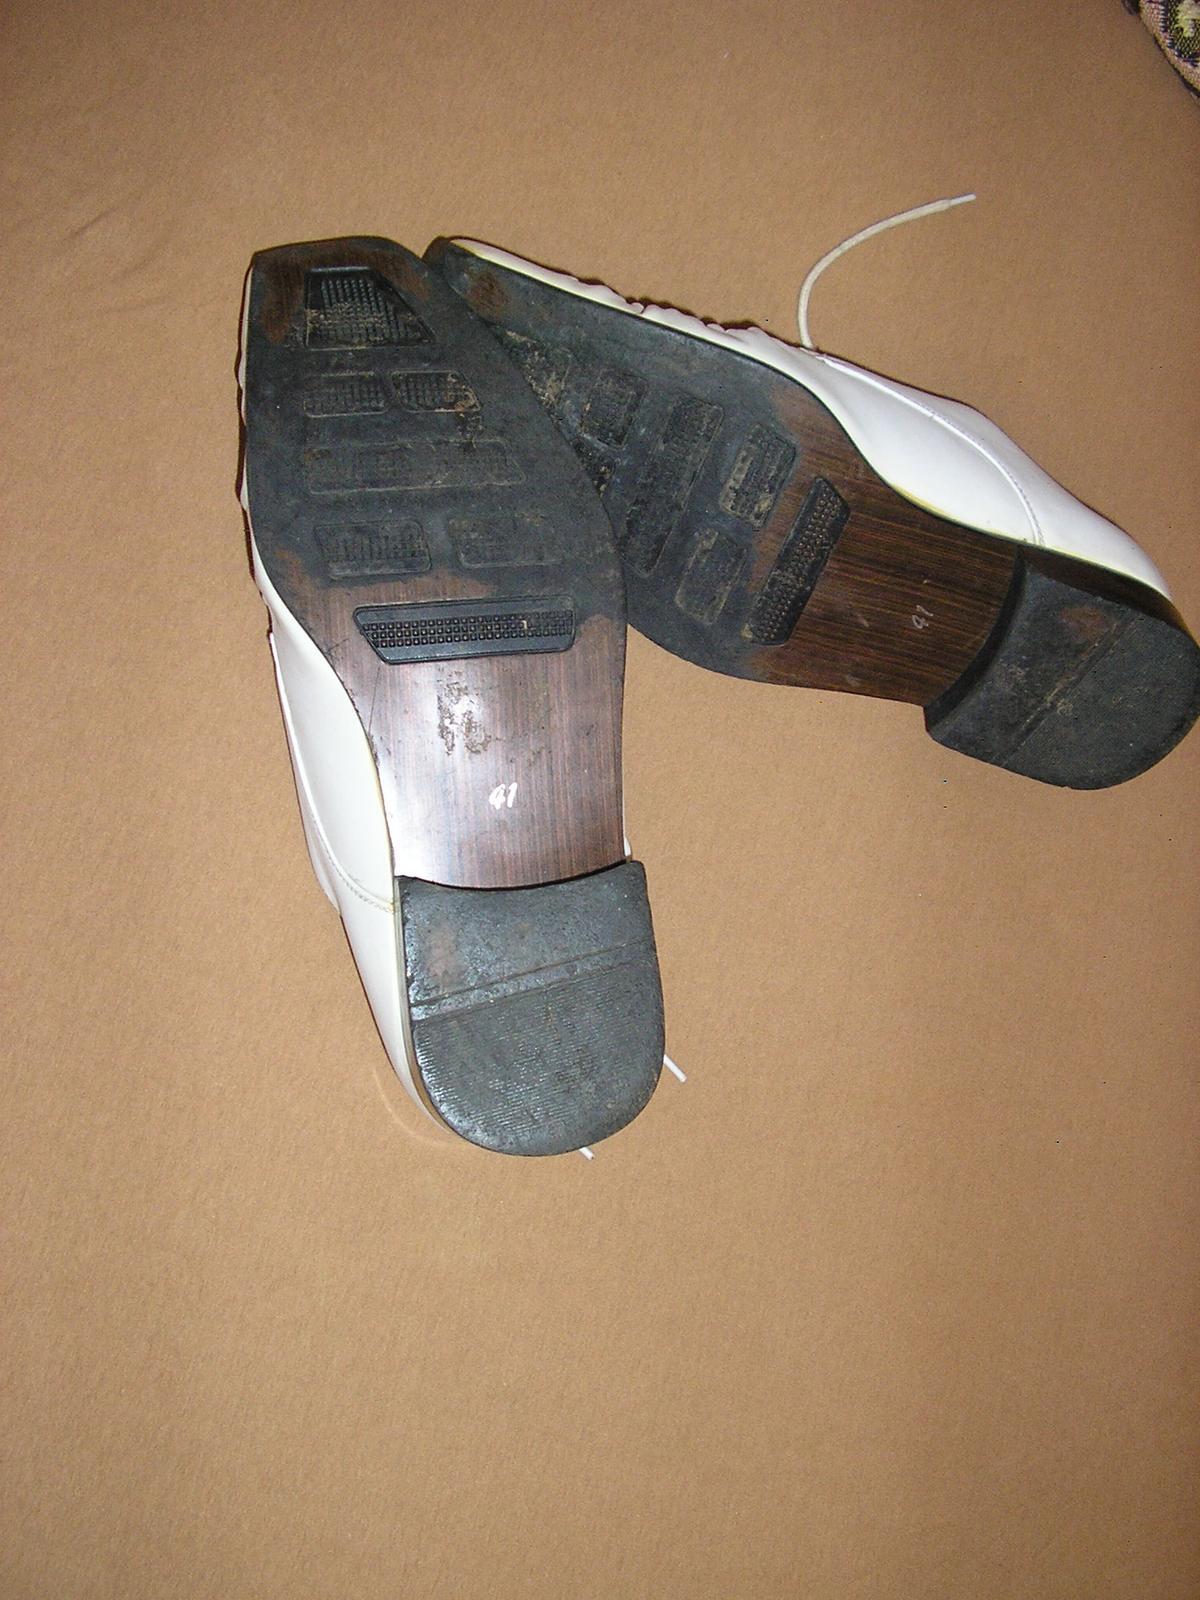 1525. W Super pánske kož. topánky č. 41 - Obrázok č. 3